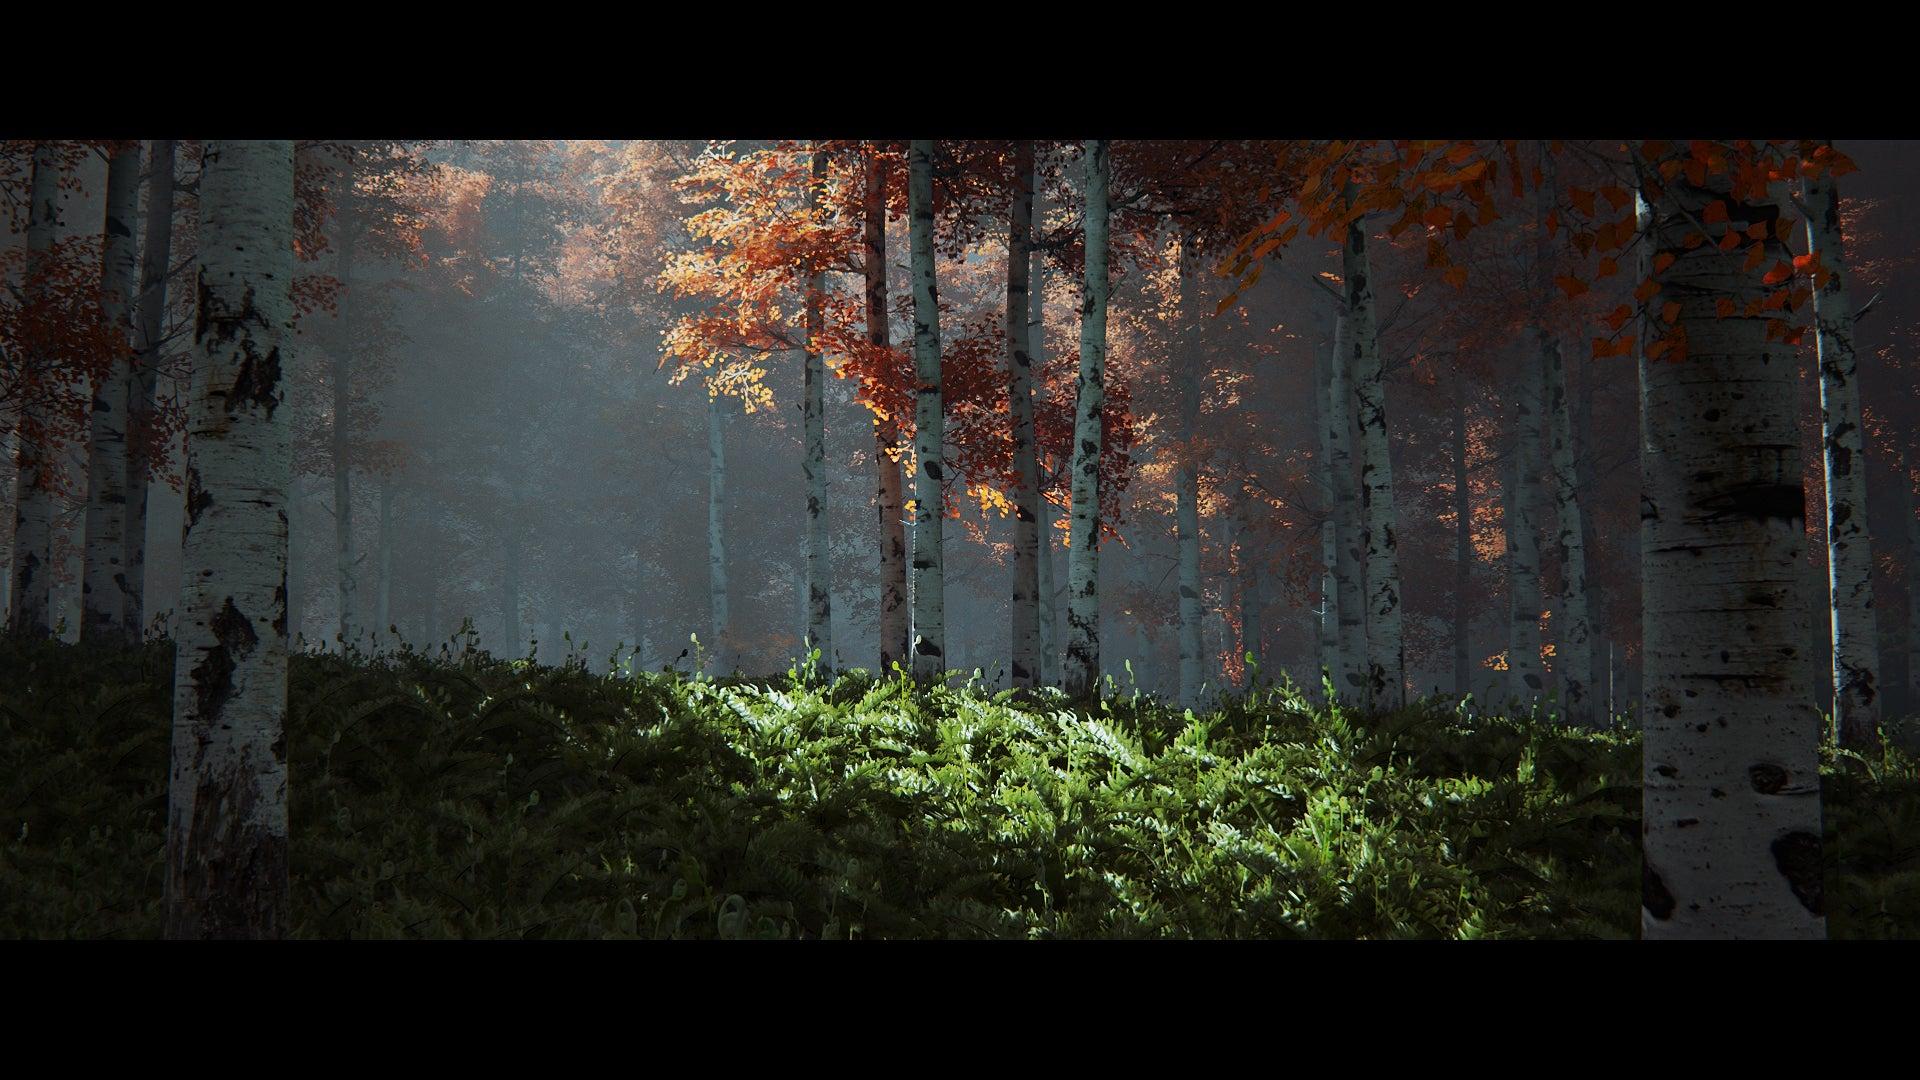 French Artist Koola Creates Photorealism Using Unreal Engine 4